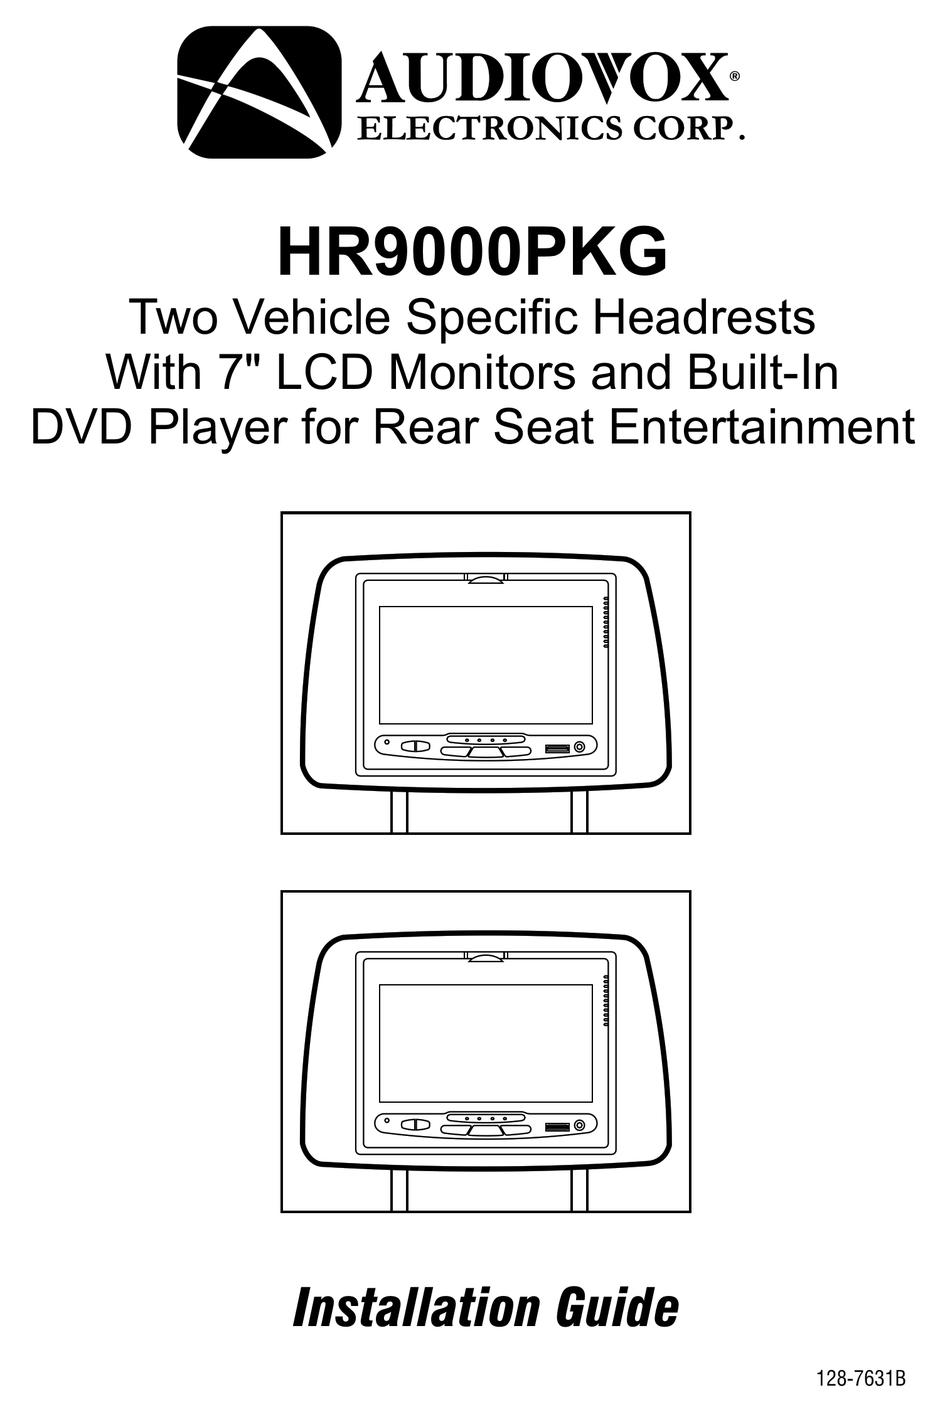 AUDIOVOX HR9000PKG INSTALLATION MANUAL Pdf Download